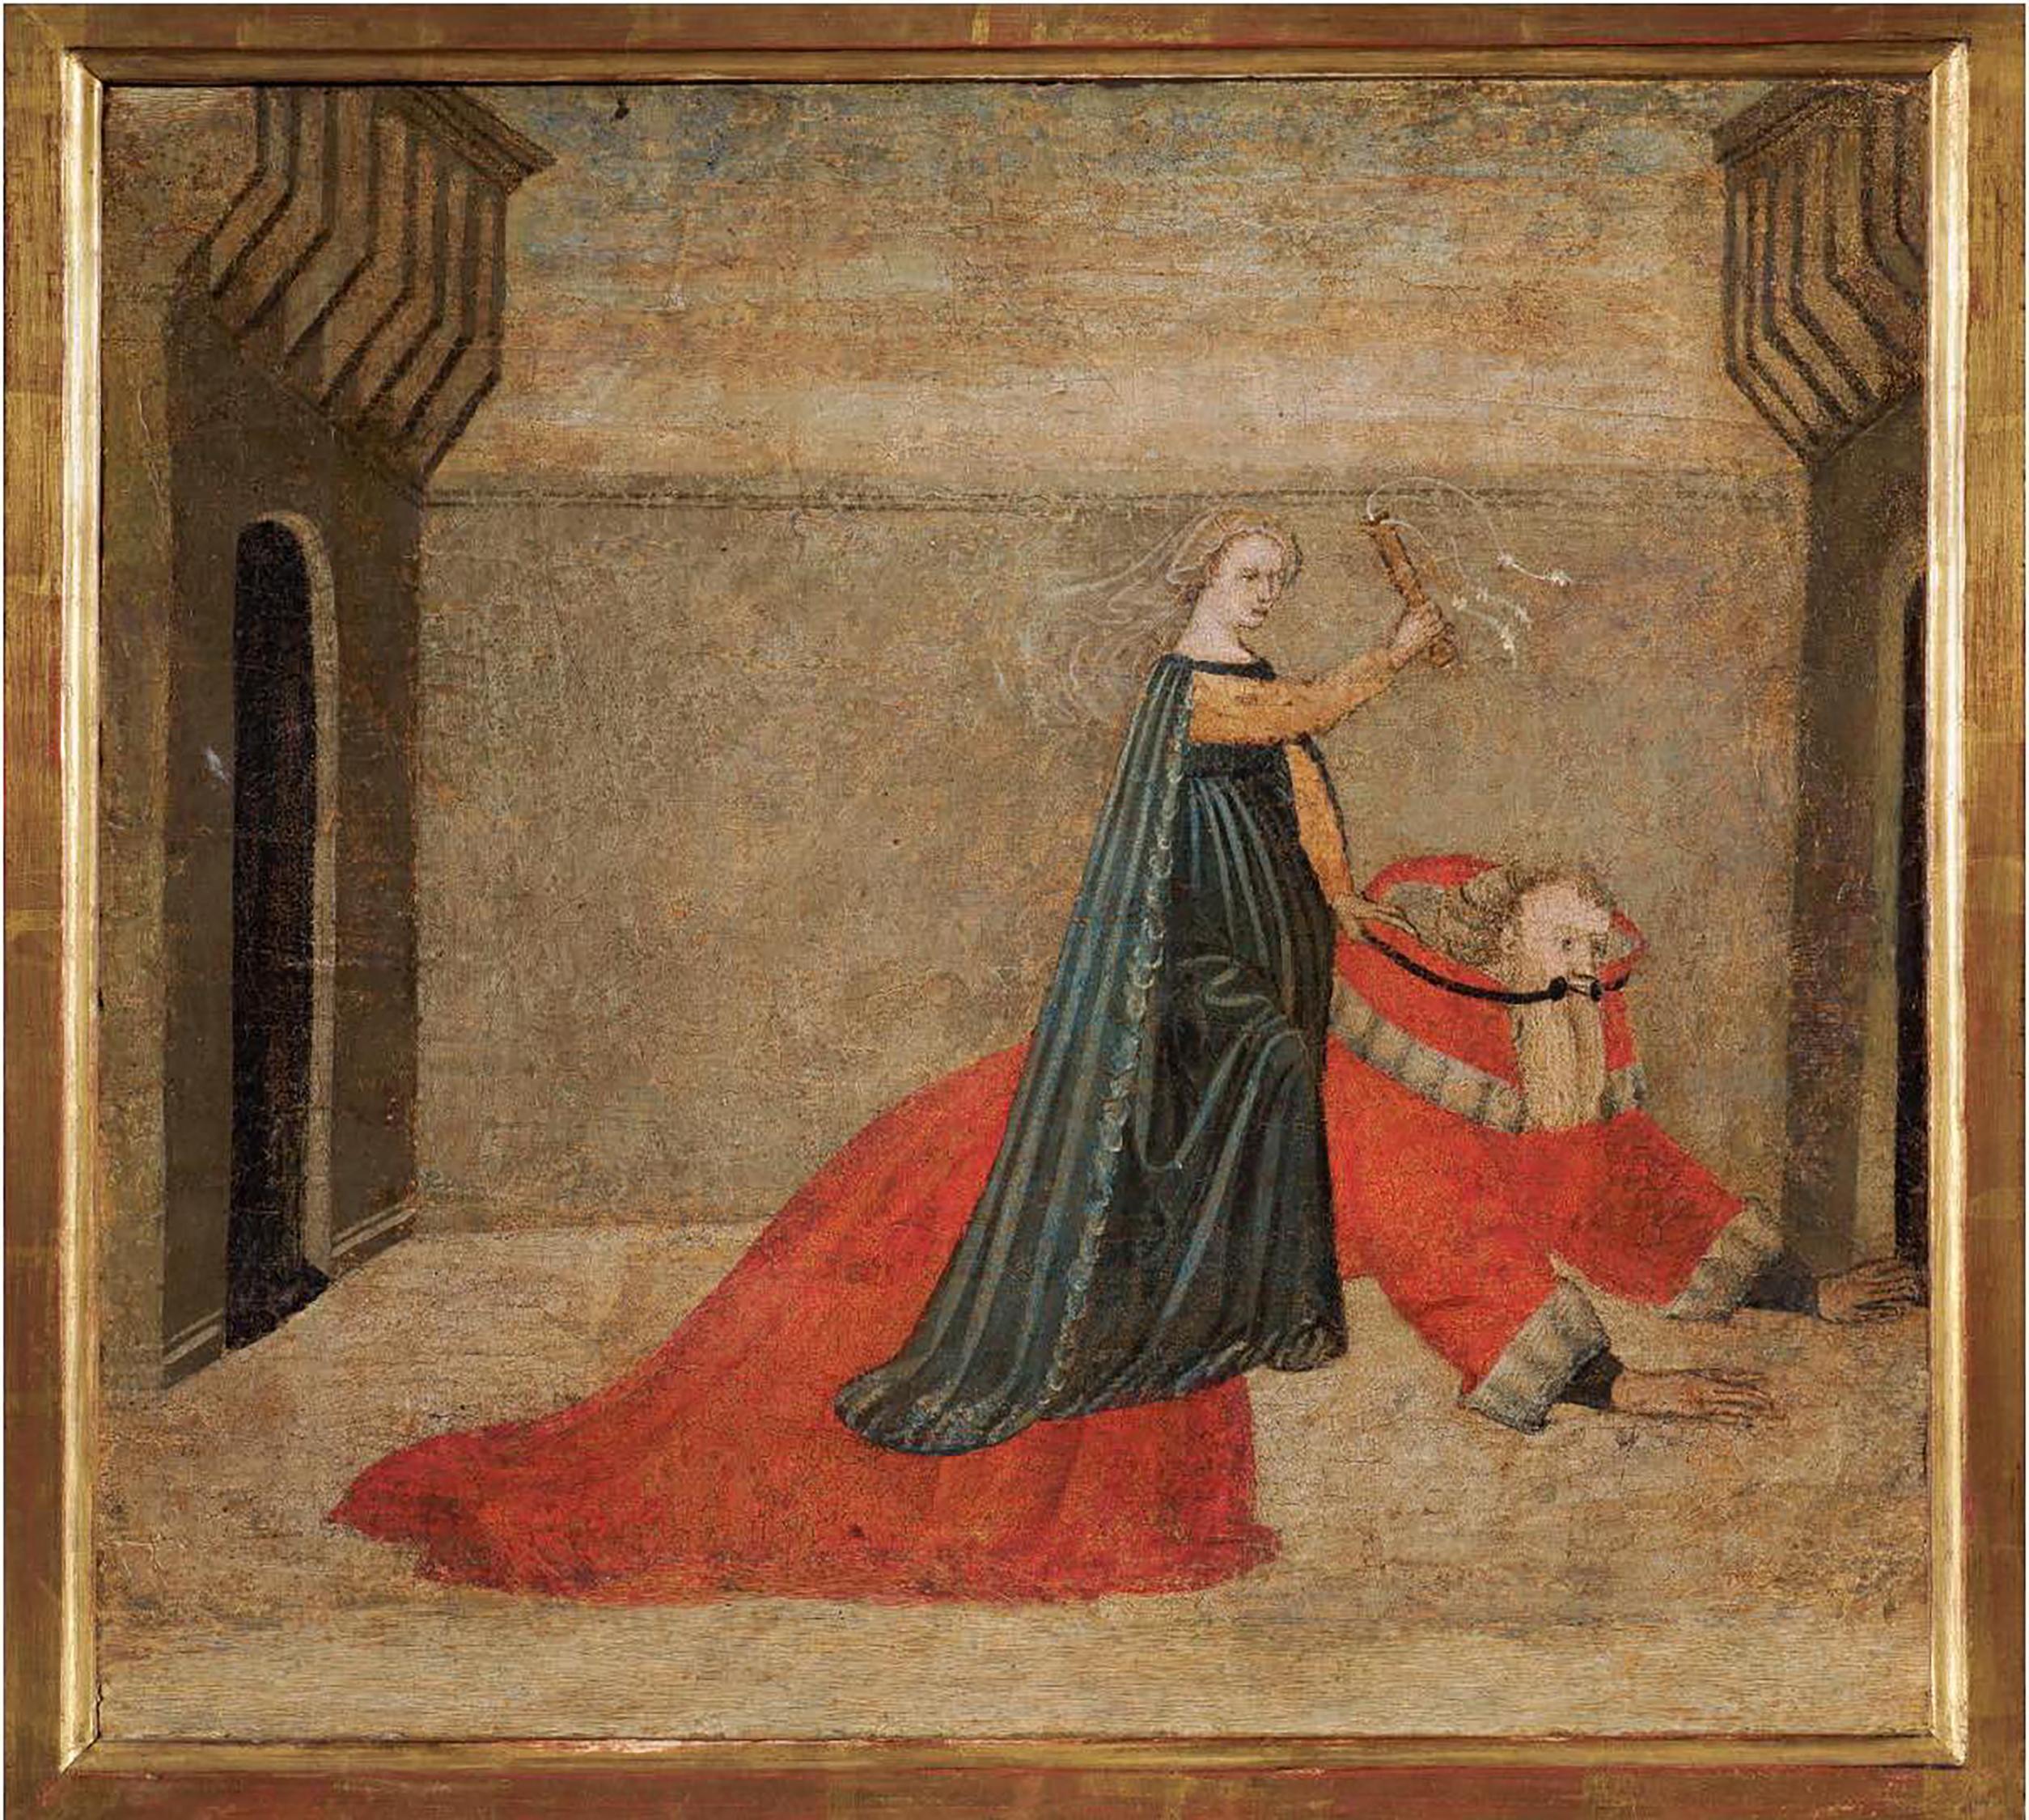 'Hay una historia de una mujer que', d'Irene Solà